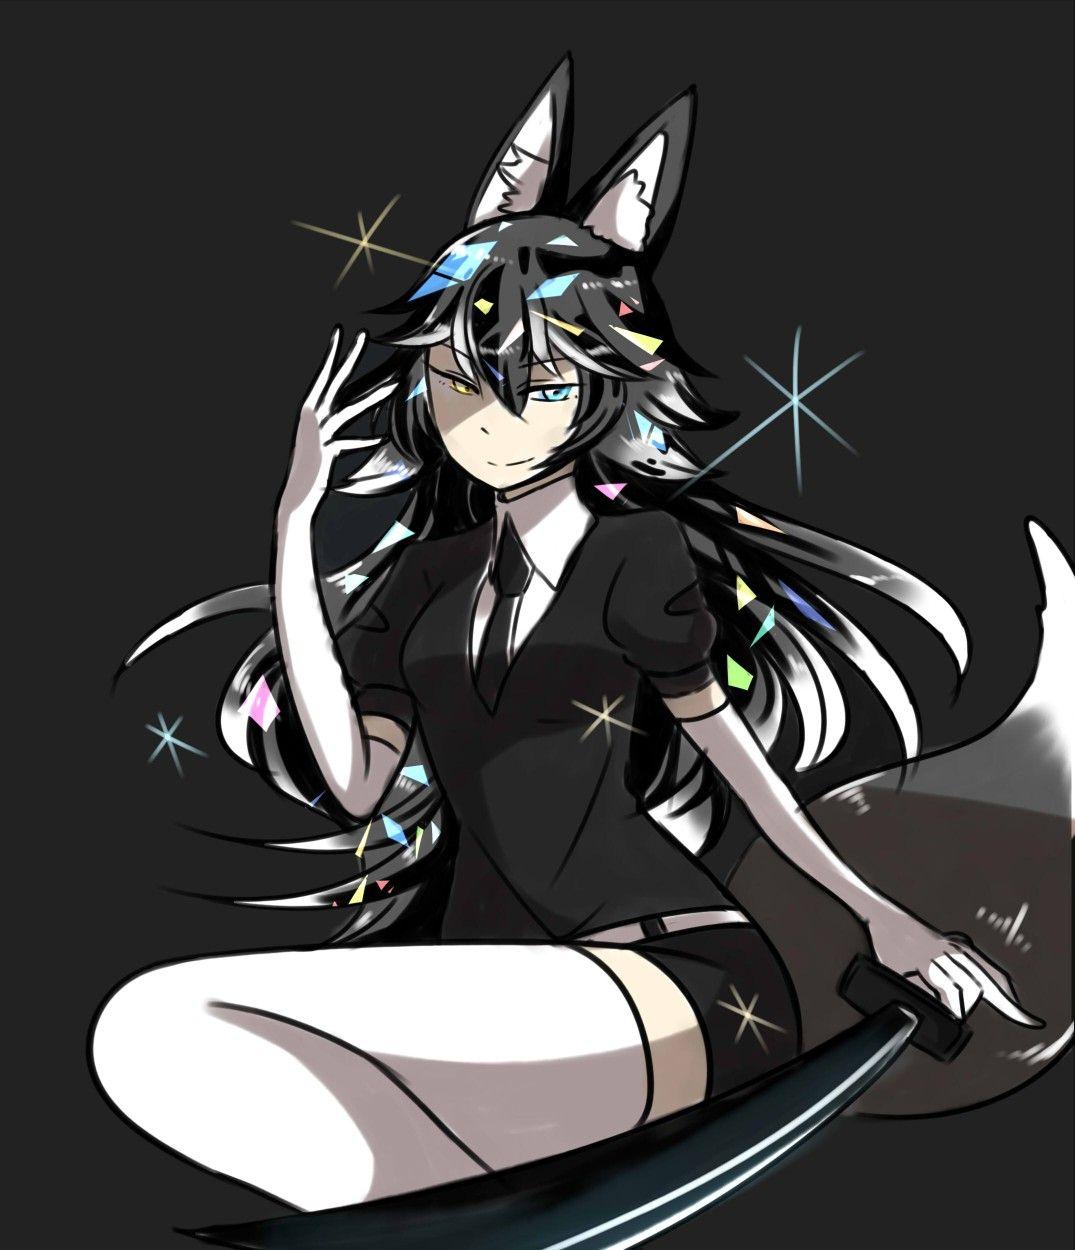 Kemono friends wolf Neko girl, Werewolf girl